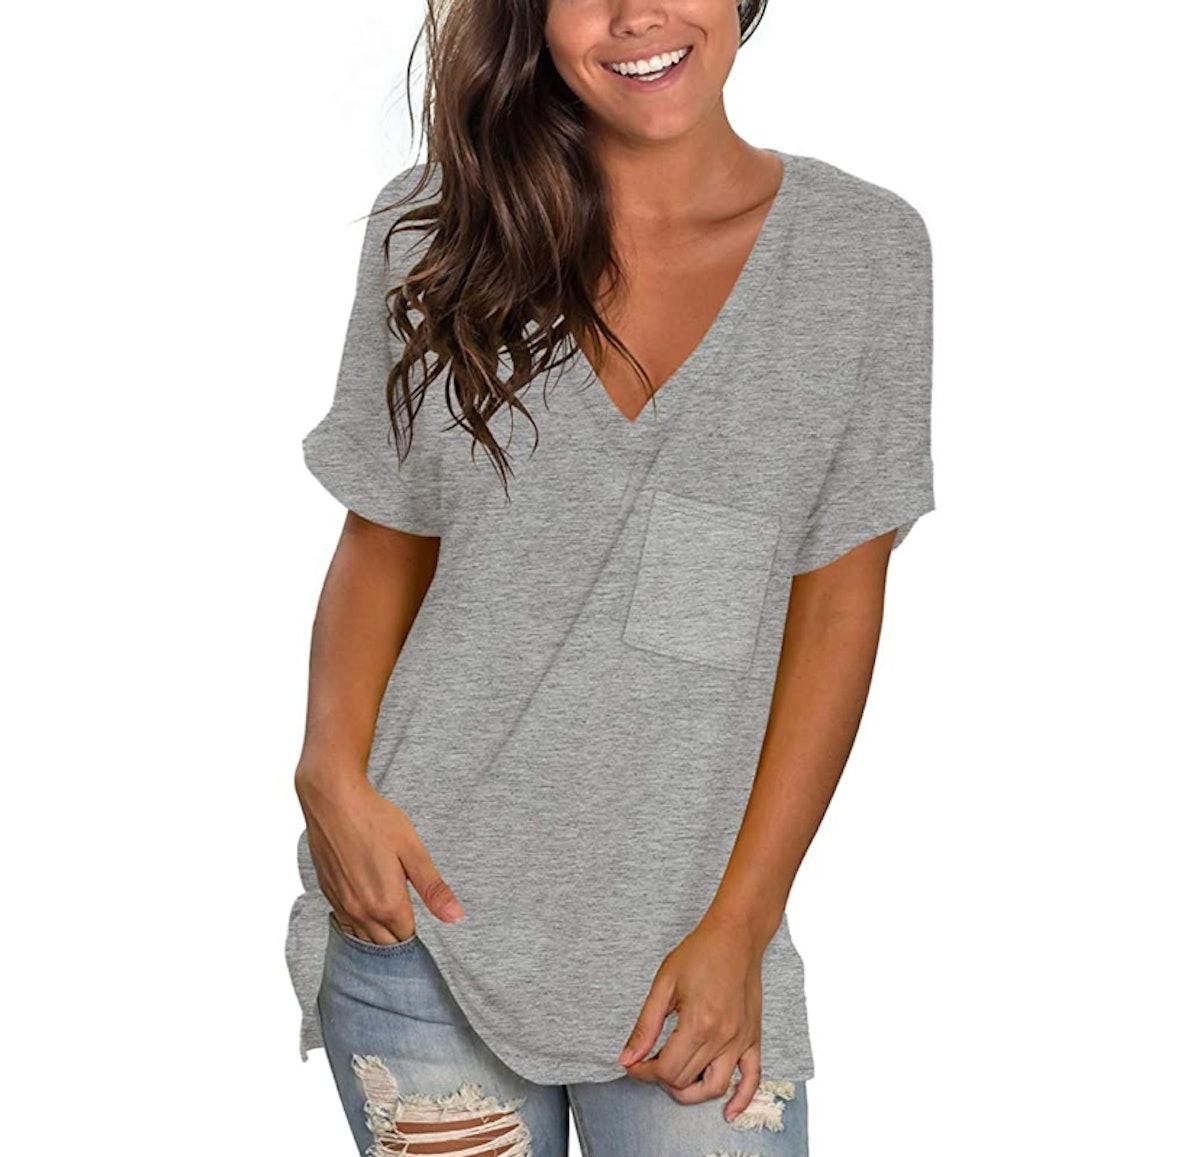 NSQTBA Basic V-Neck T-Shirt